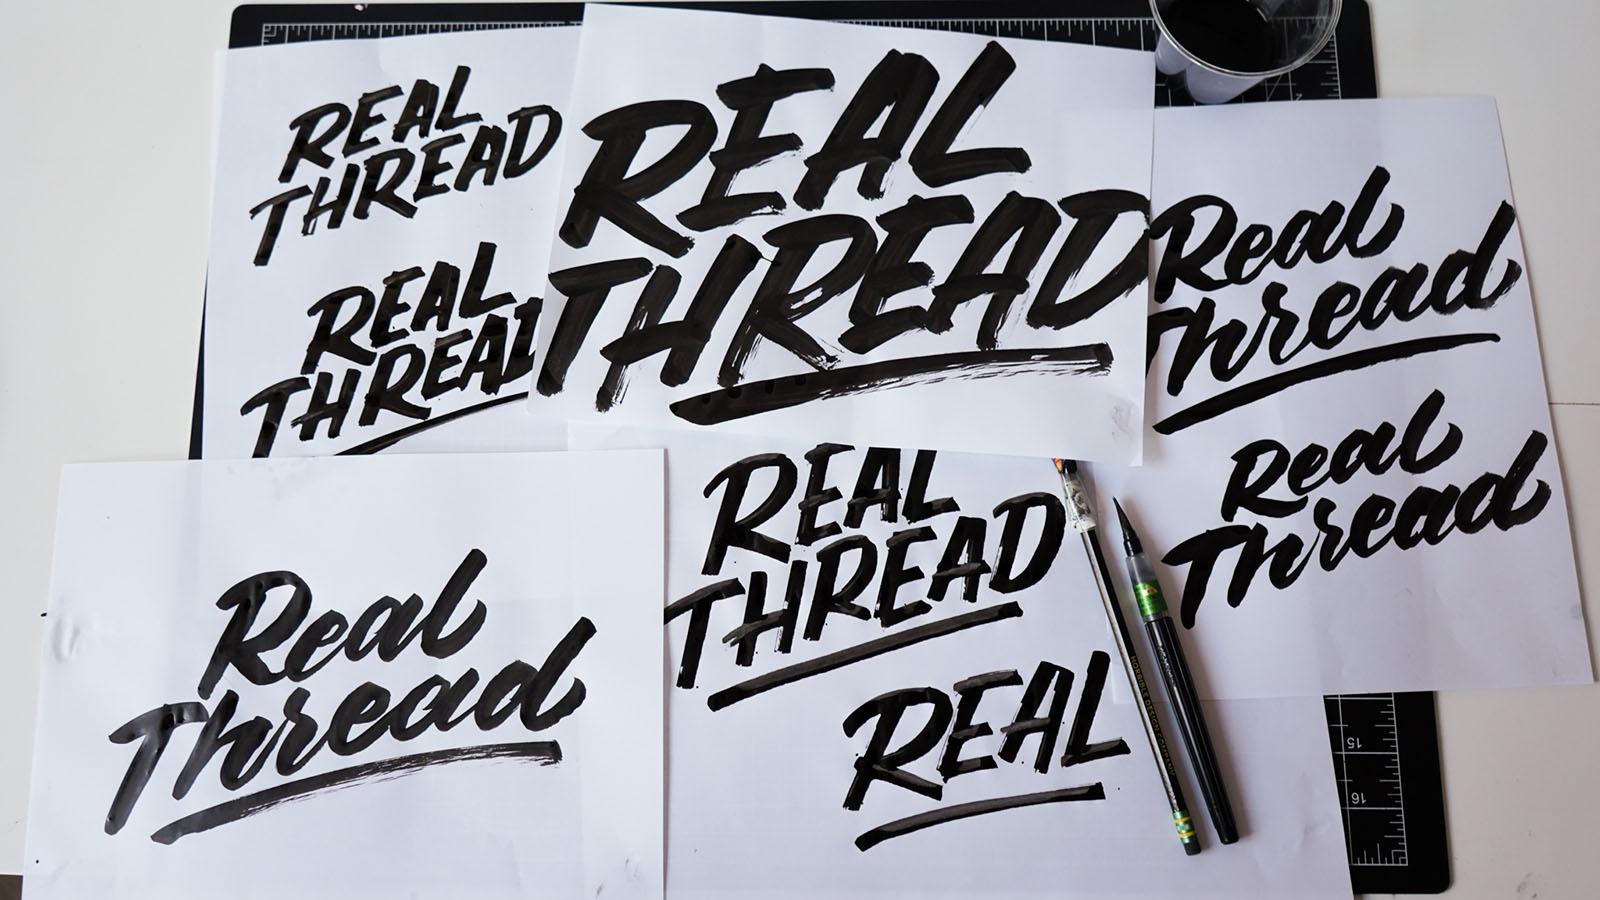 real thread hand lettered samples on desk